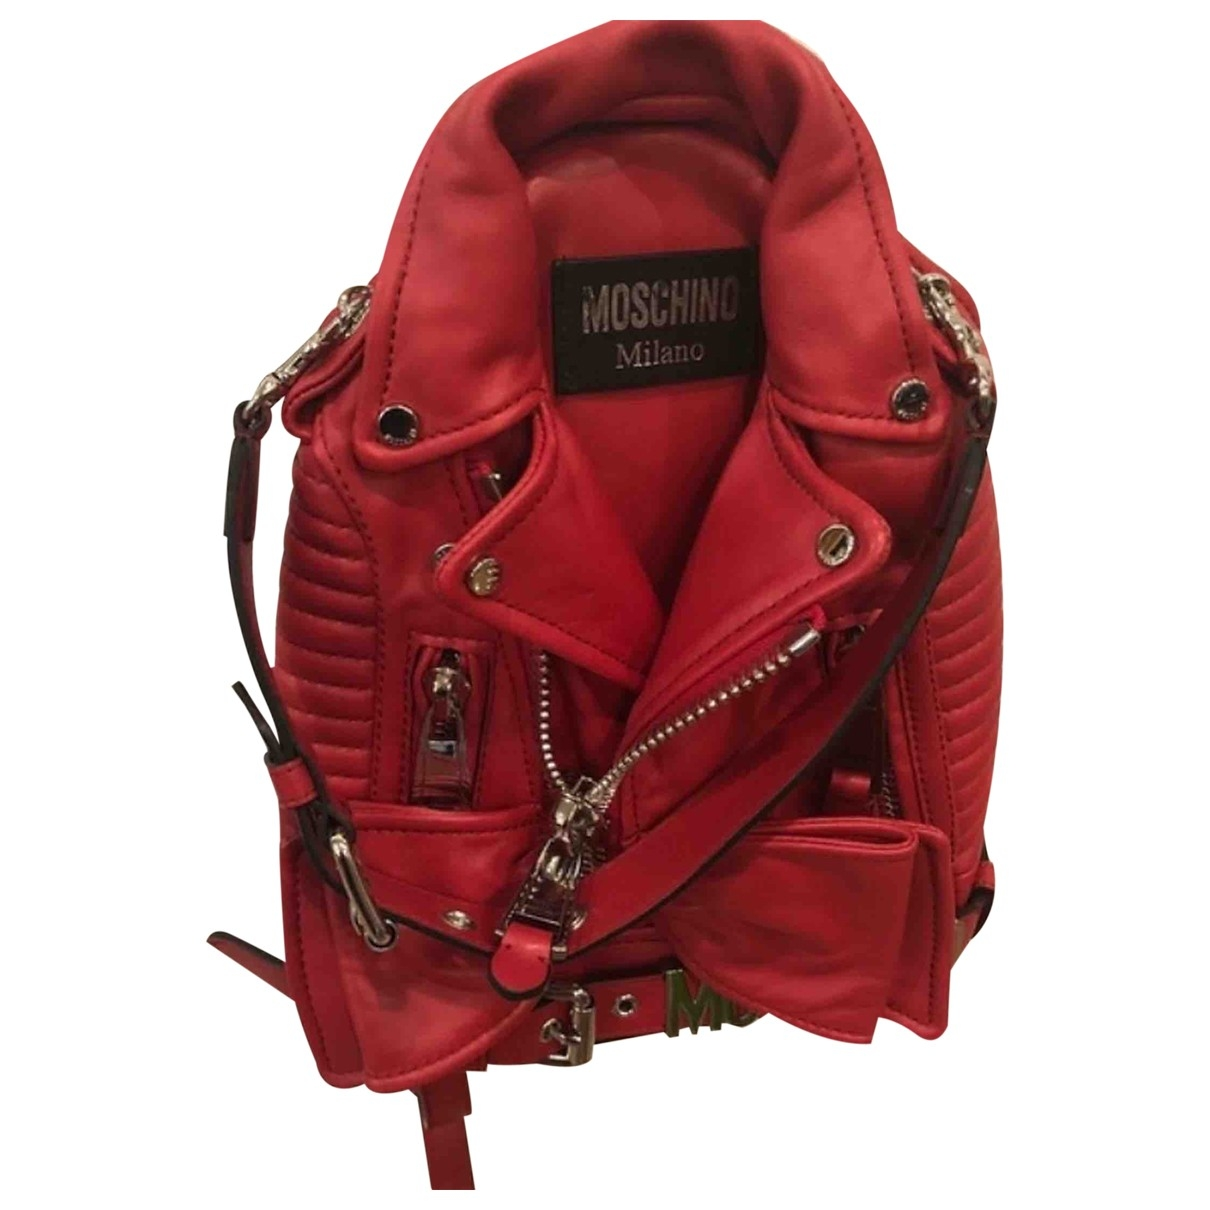 Moschino - Sac a dos Biker pour femme en cuir - rouge